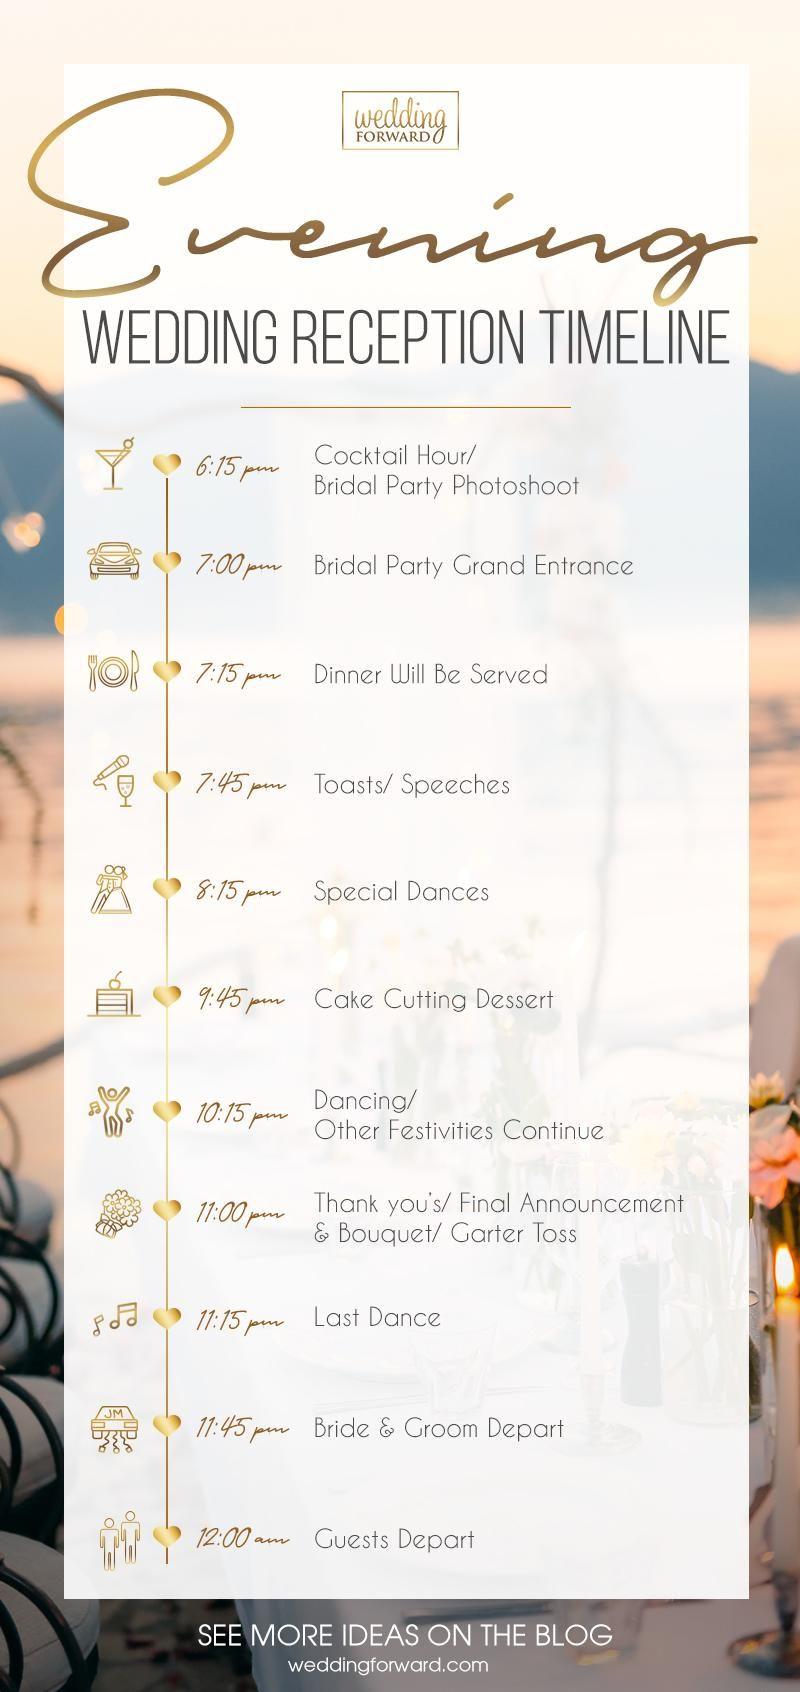 Expert Tips To Create Wedding Reception Timeline & 3 Sample Ideas